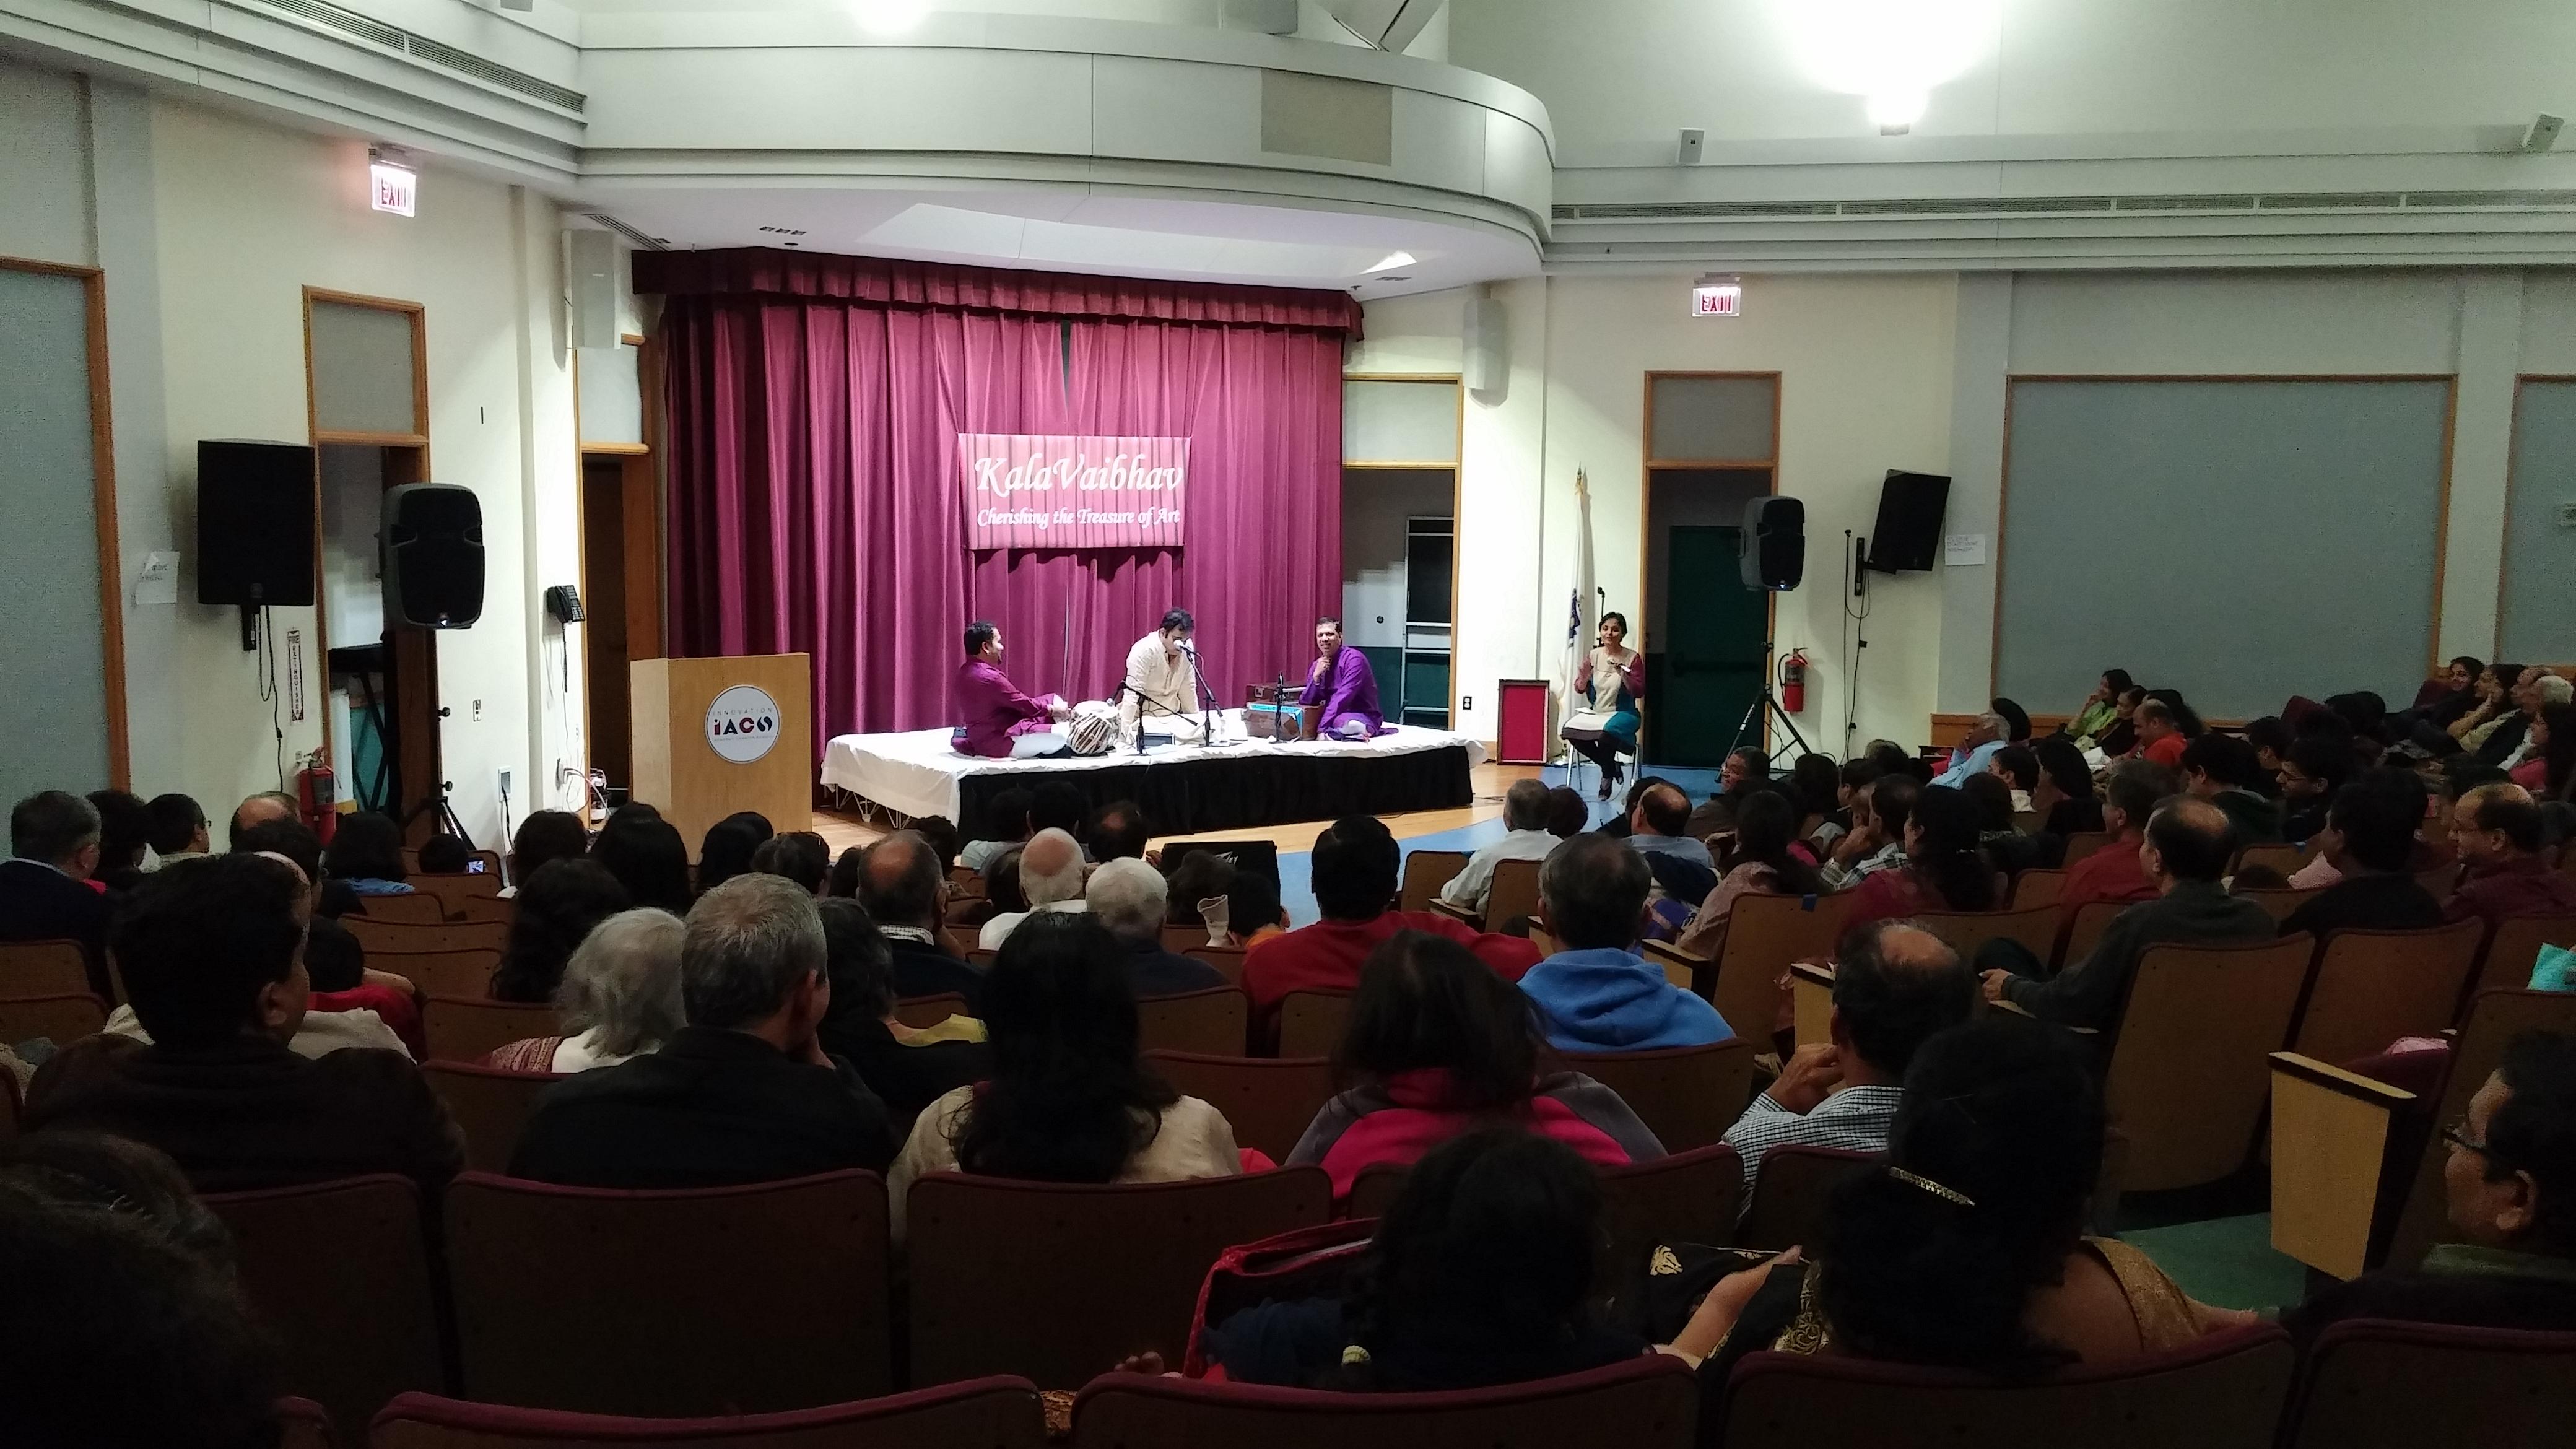 Rahul Deshpande Concert 2015 - 2